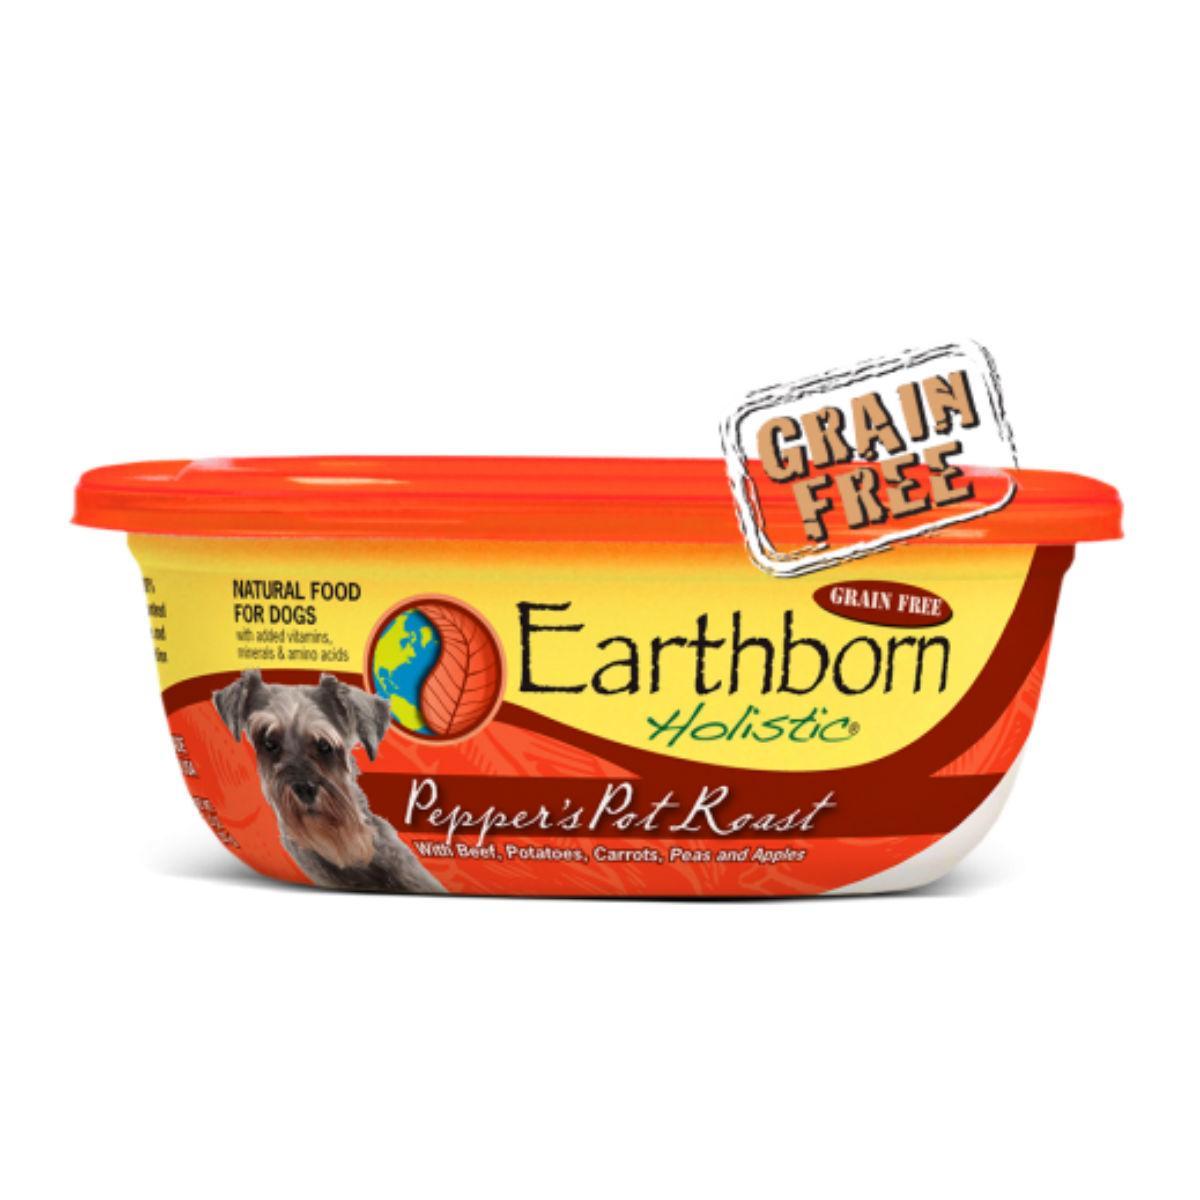 Earthborn Holistic Pepper's Pot Roast Stew Wet Dog Food